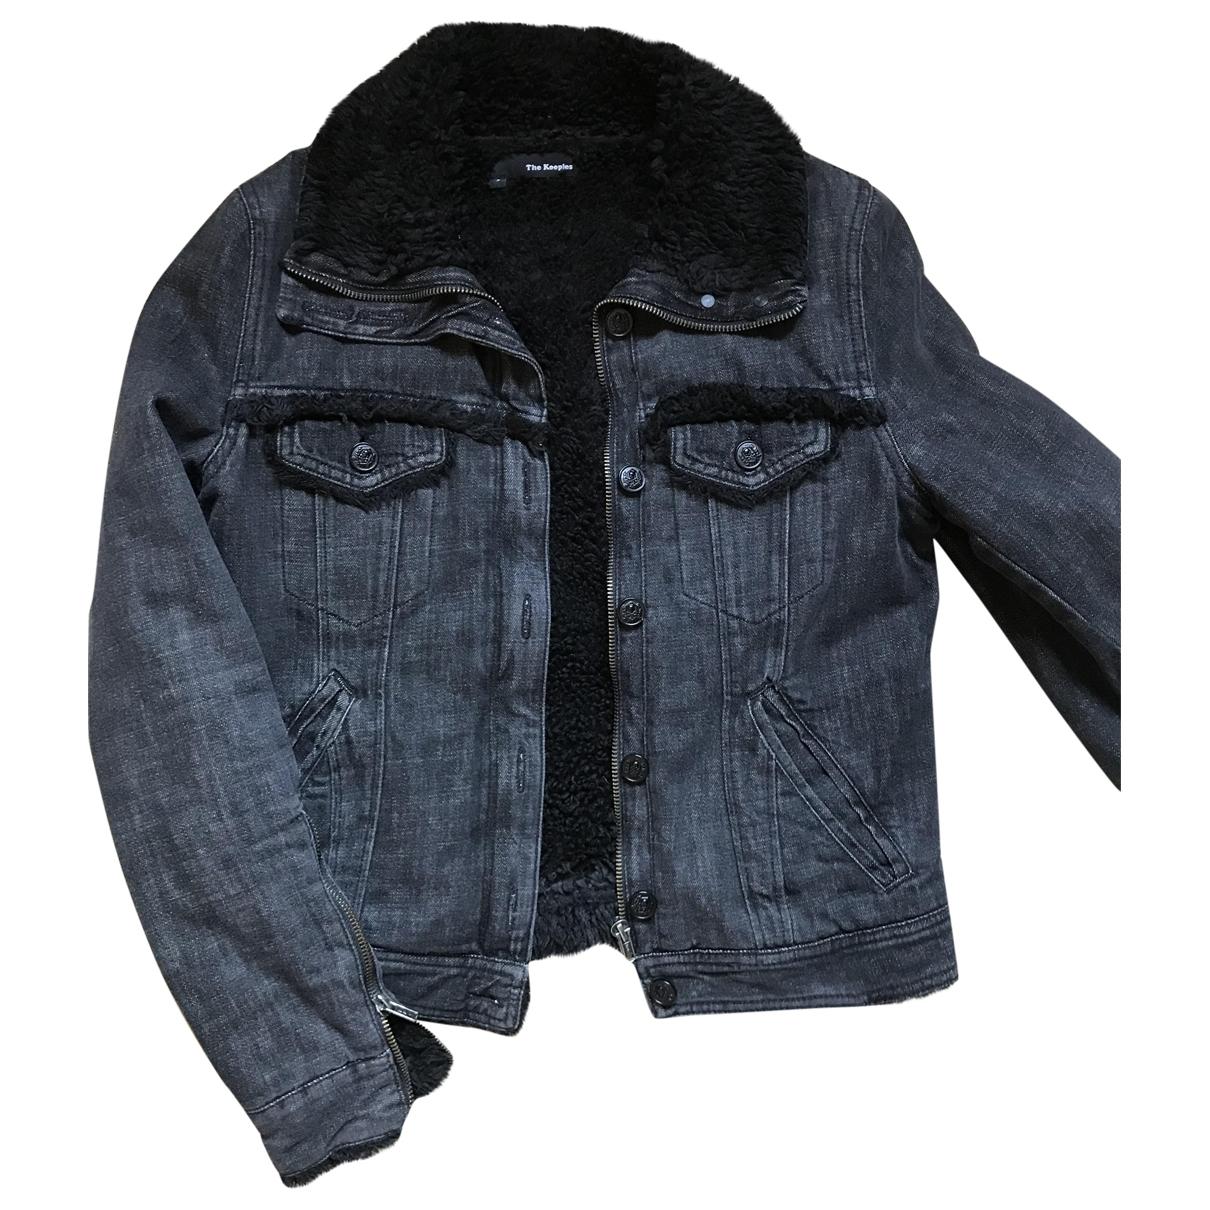 The Kooples \N Anthracite Denim - Jeans jacket for Women S International